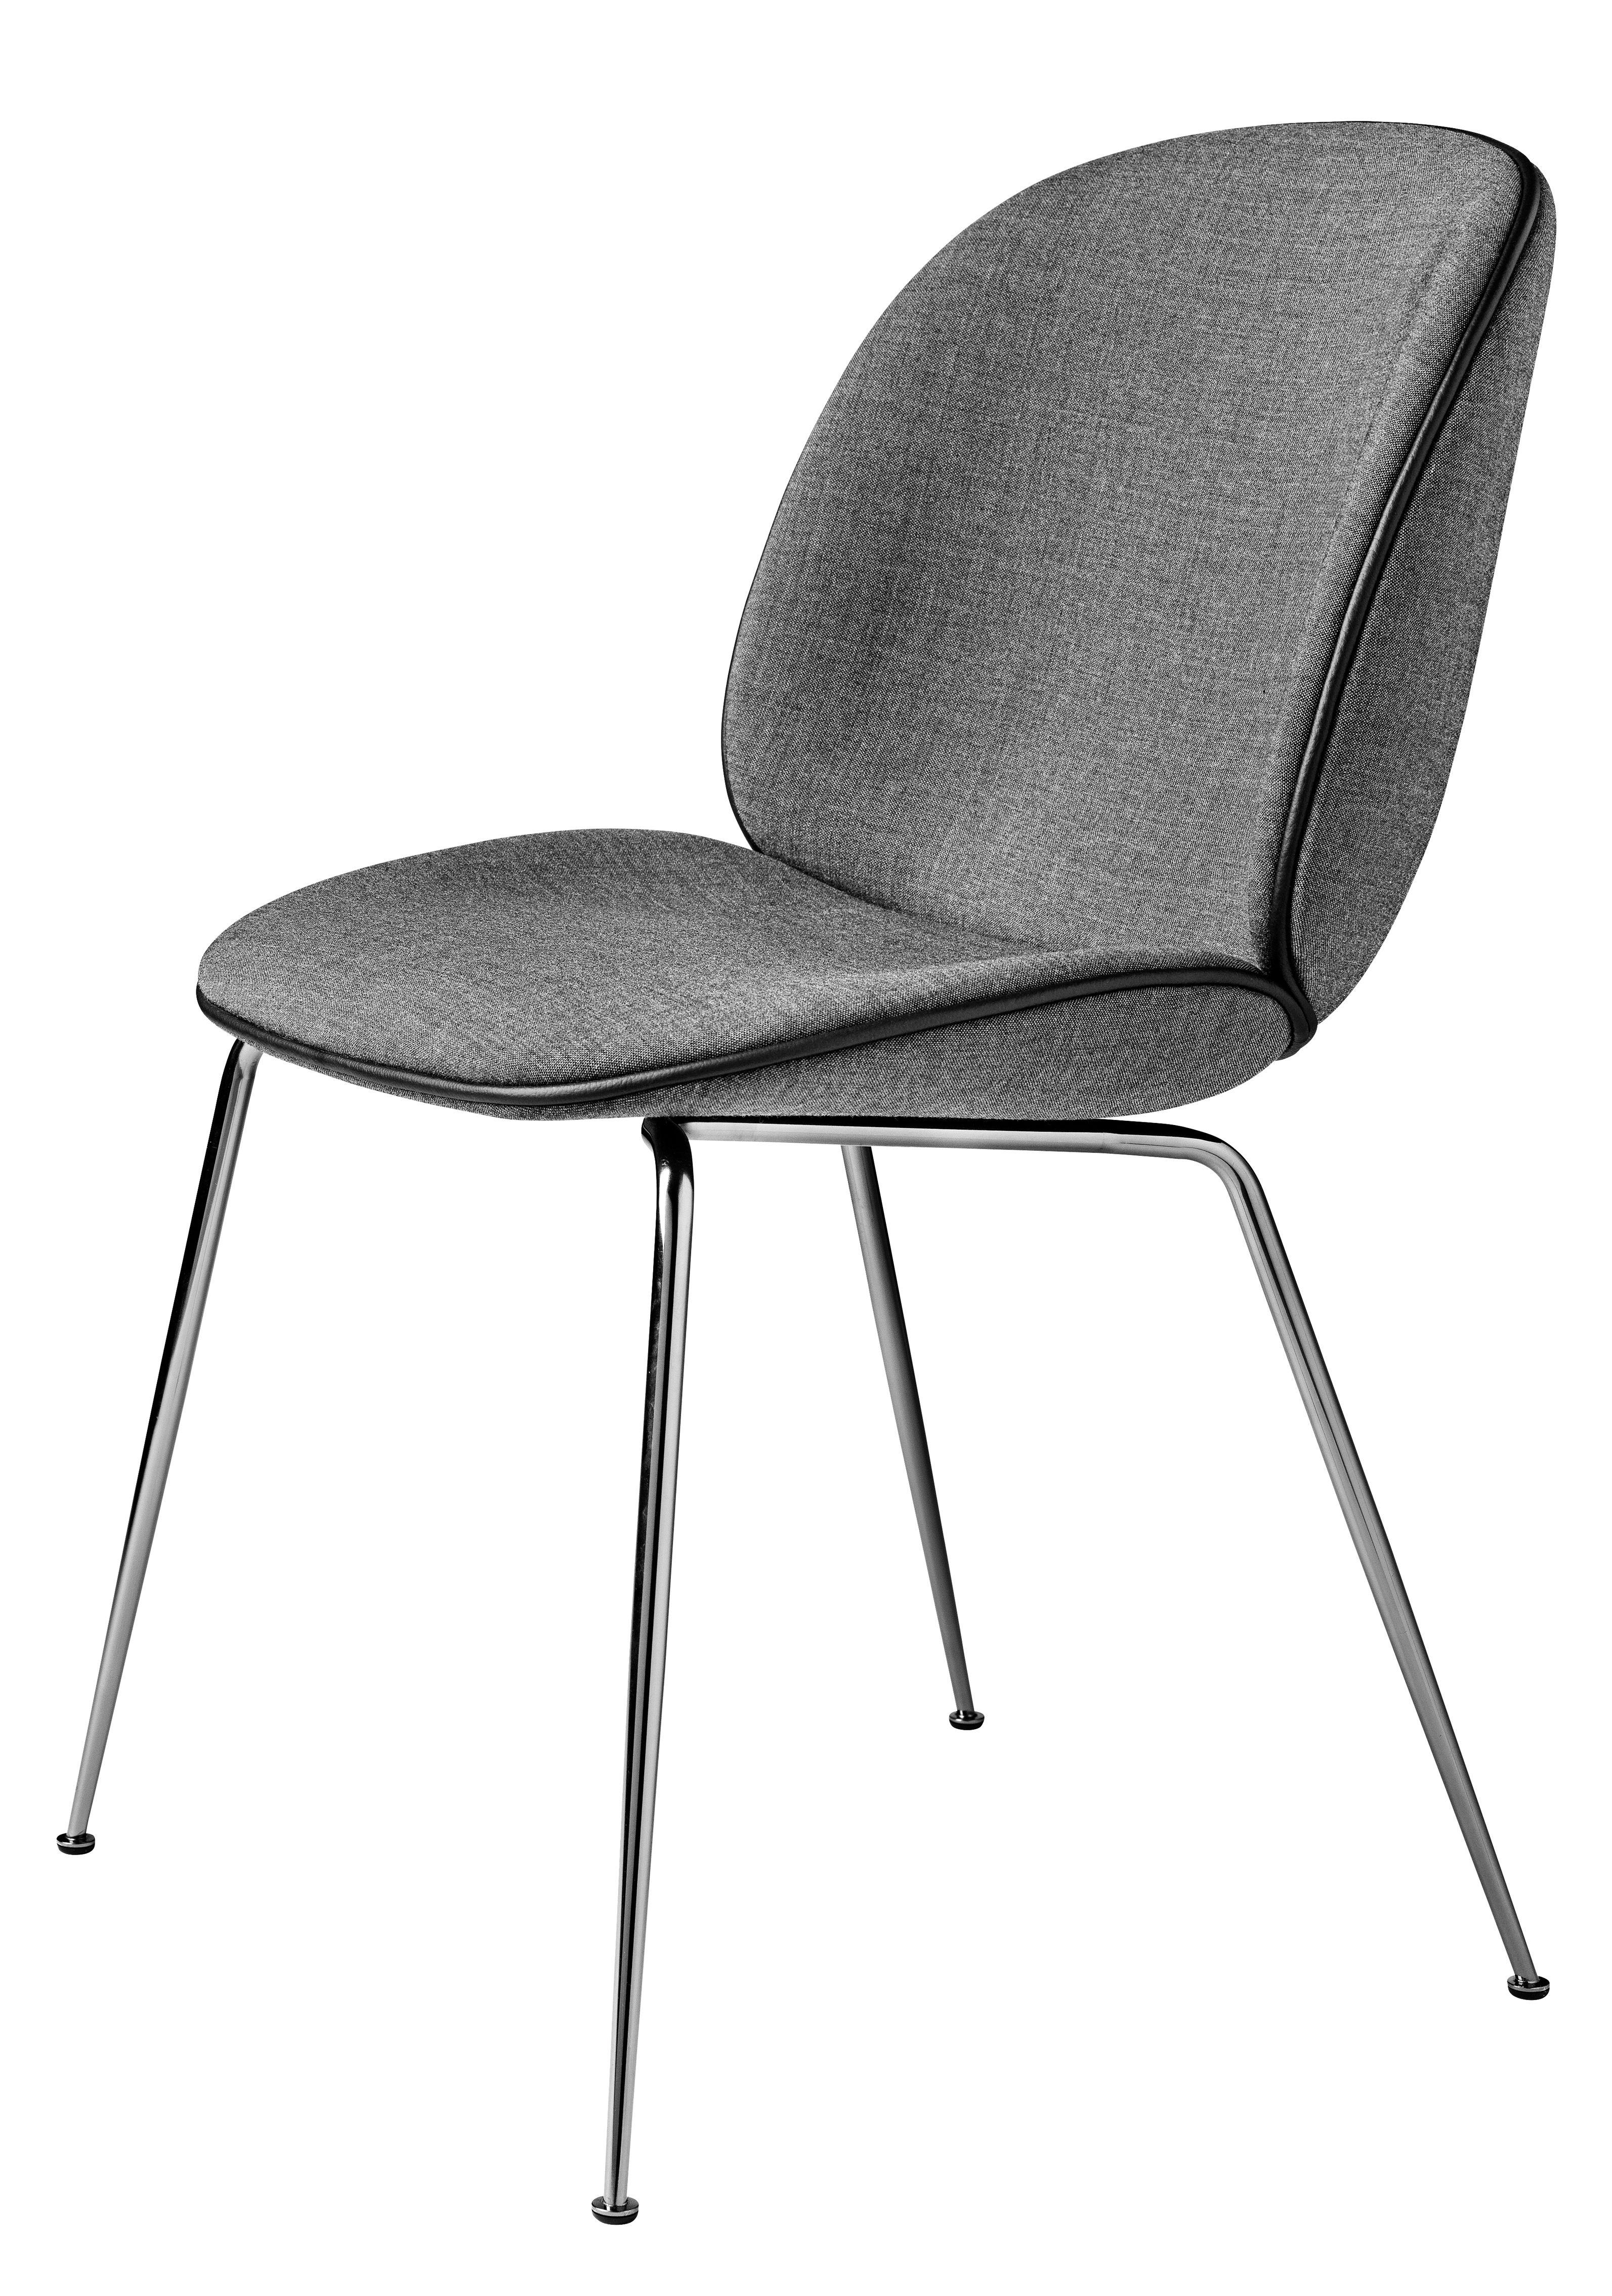 beetle gepolsterter stuhl gamfratesi grau stuhlbeine chrom gl nzend by gubi made in design. Black Bedroom Furniture Sets. Home Design Ideas